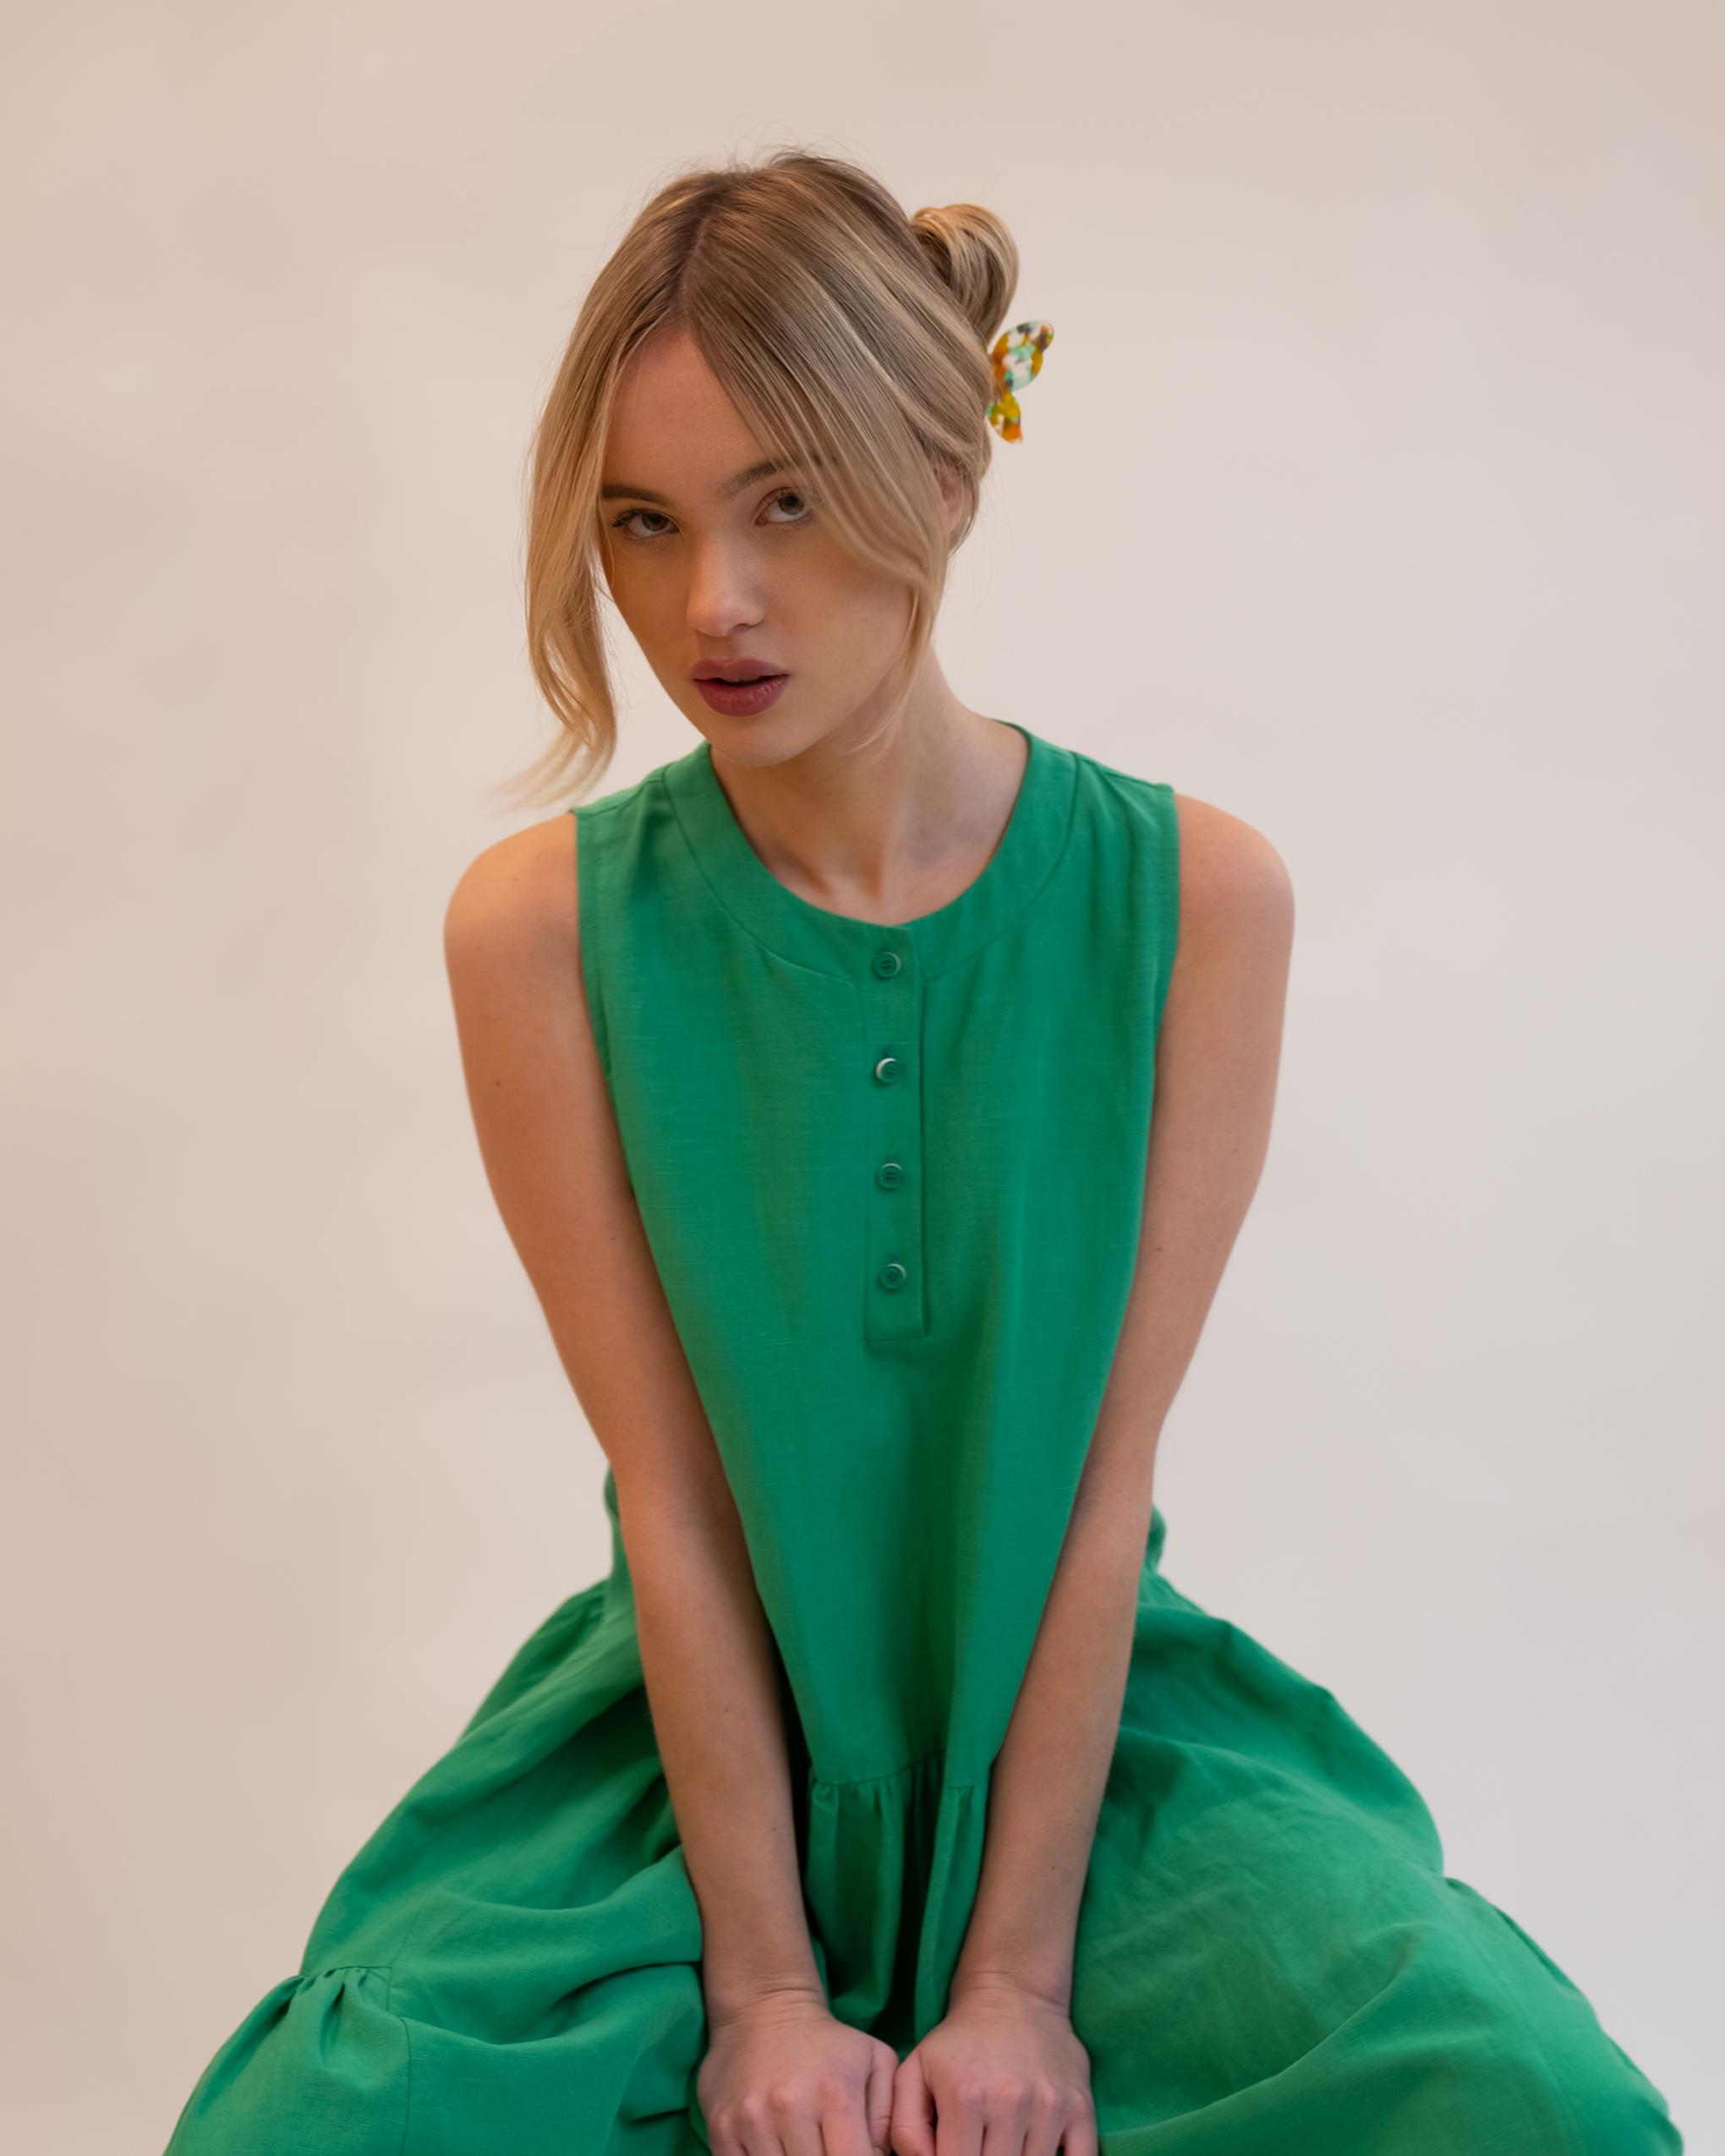 Model wearing Emin + Paul springtime butterfly hair claw.